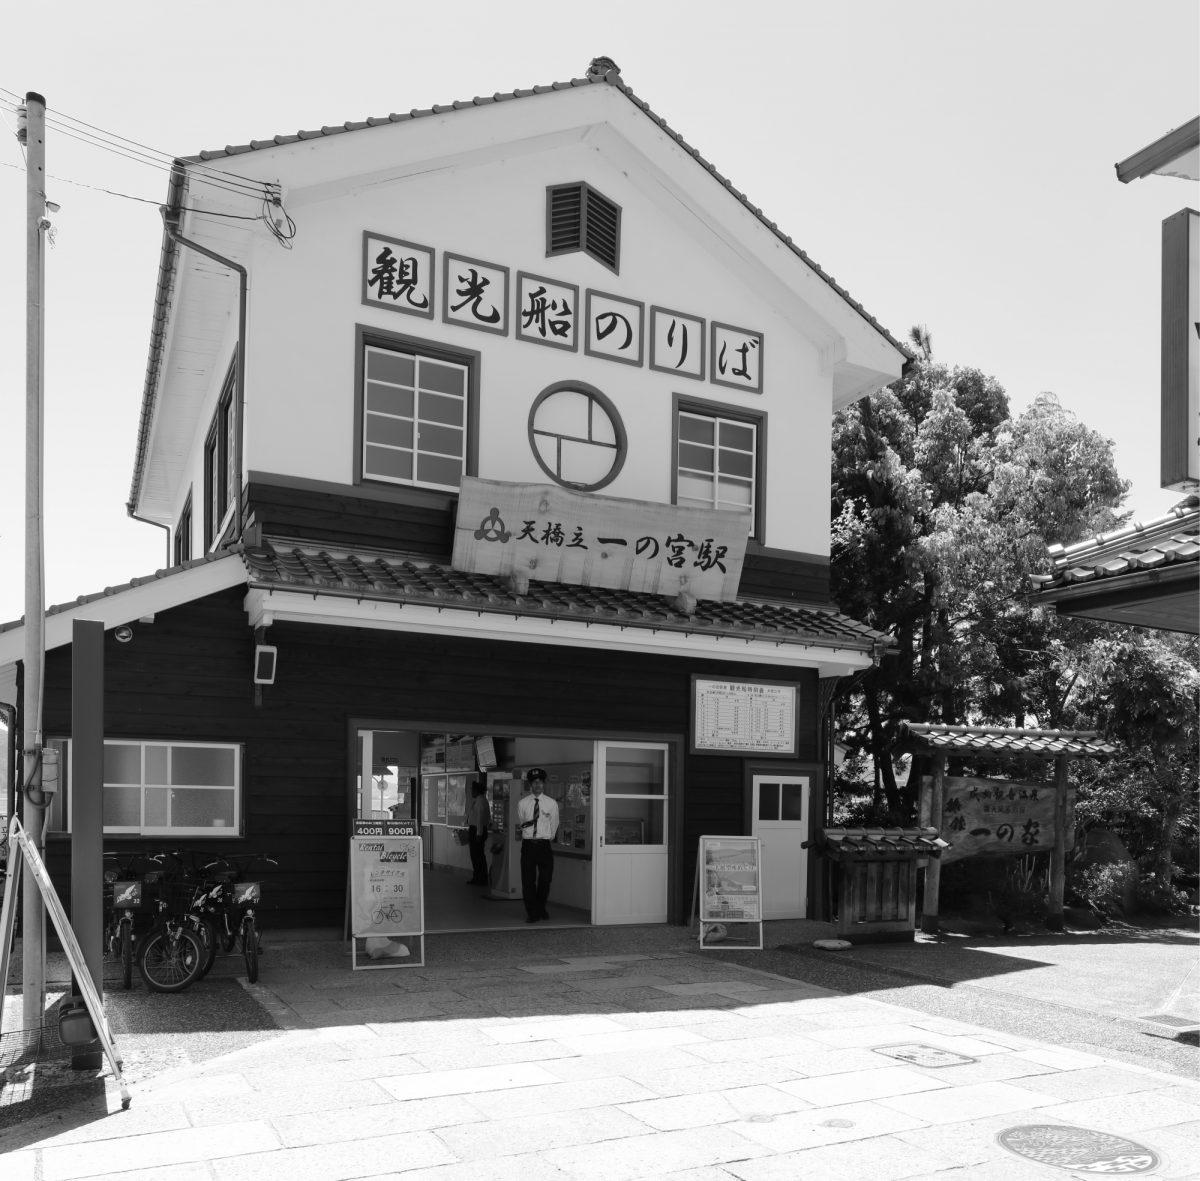 2017年5月19日【天橋立一の宮駅】宮津市大垣118-1